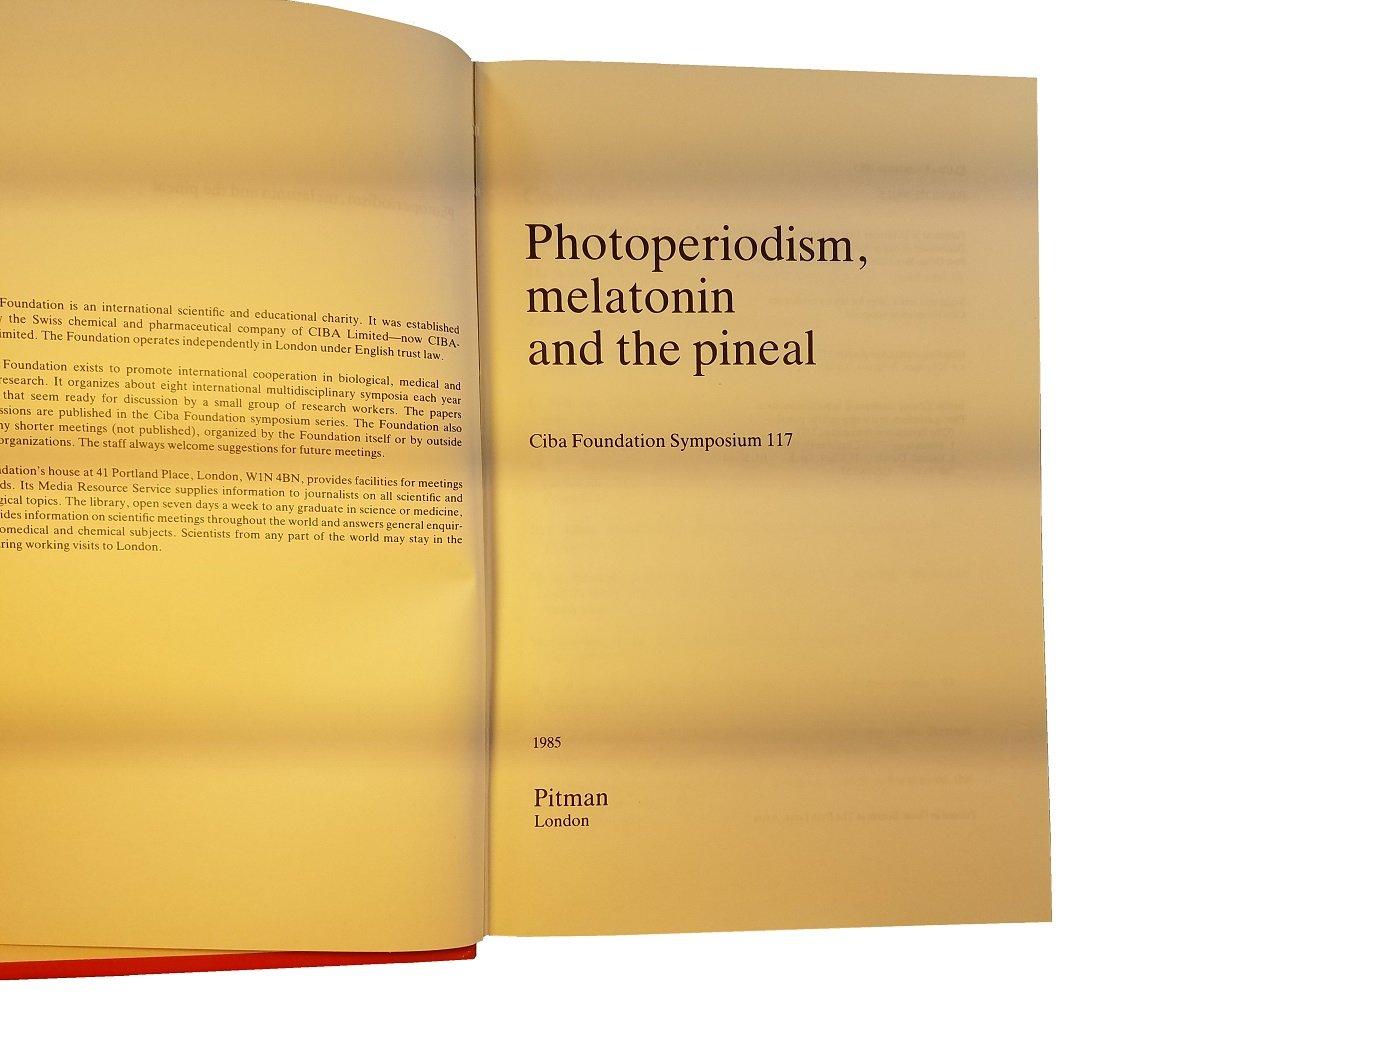 Photoperiodism, Melatonin and the Pineal (Ciba Foundation Symposium): David., Clark, Sarah., Editors Evered: 9780272798218: Amazon.com: Books